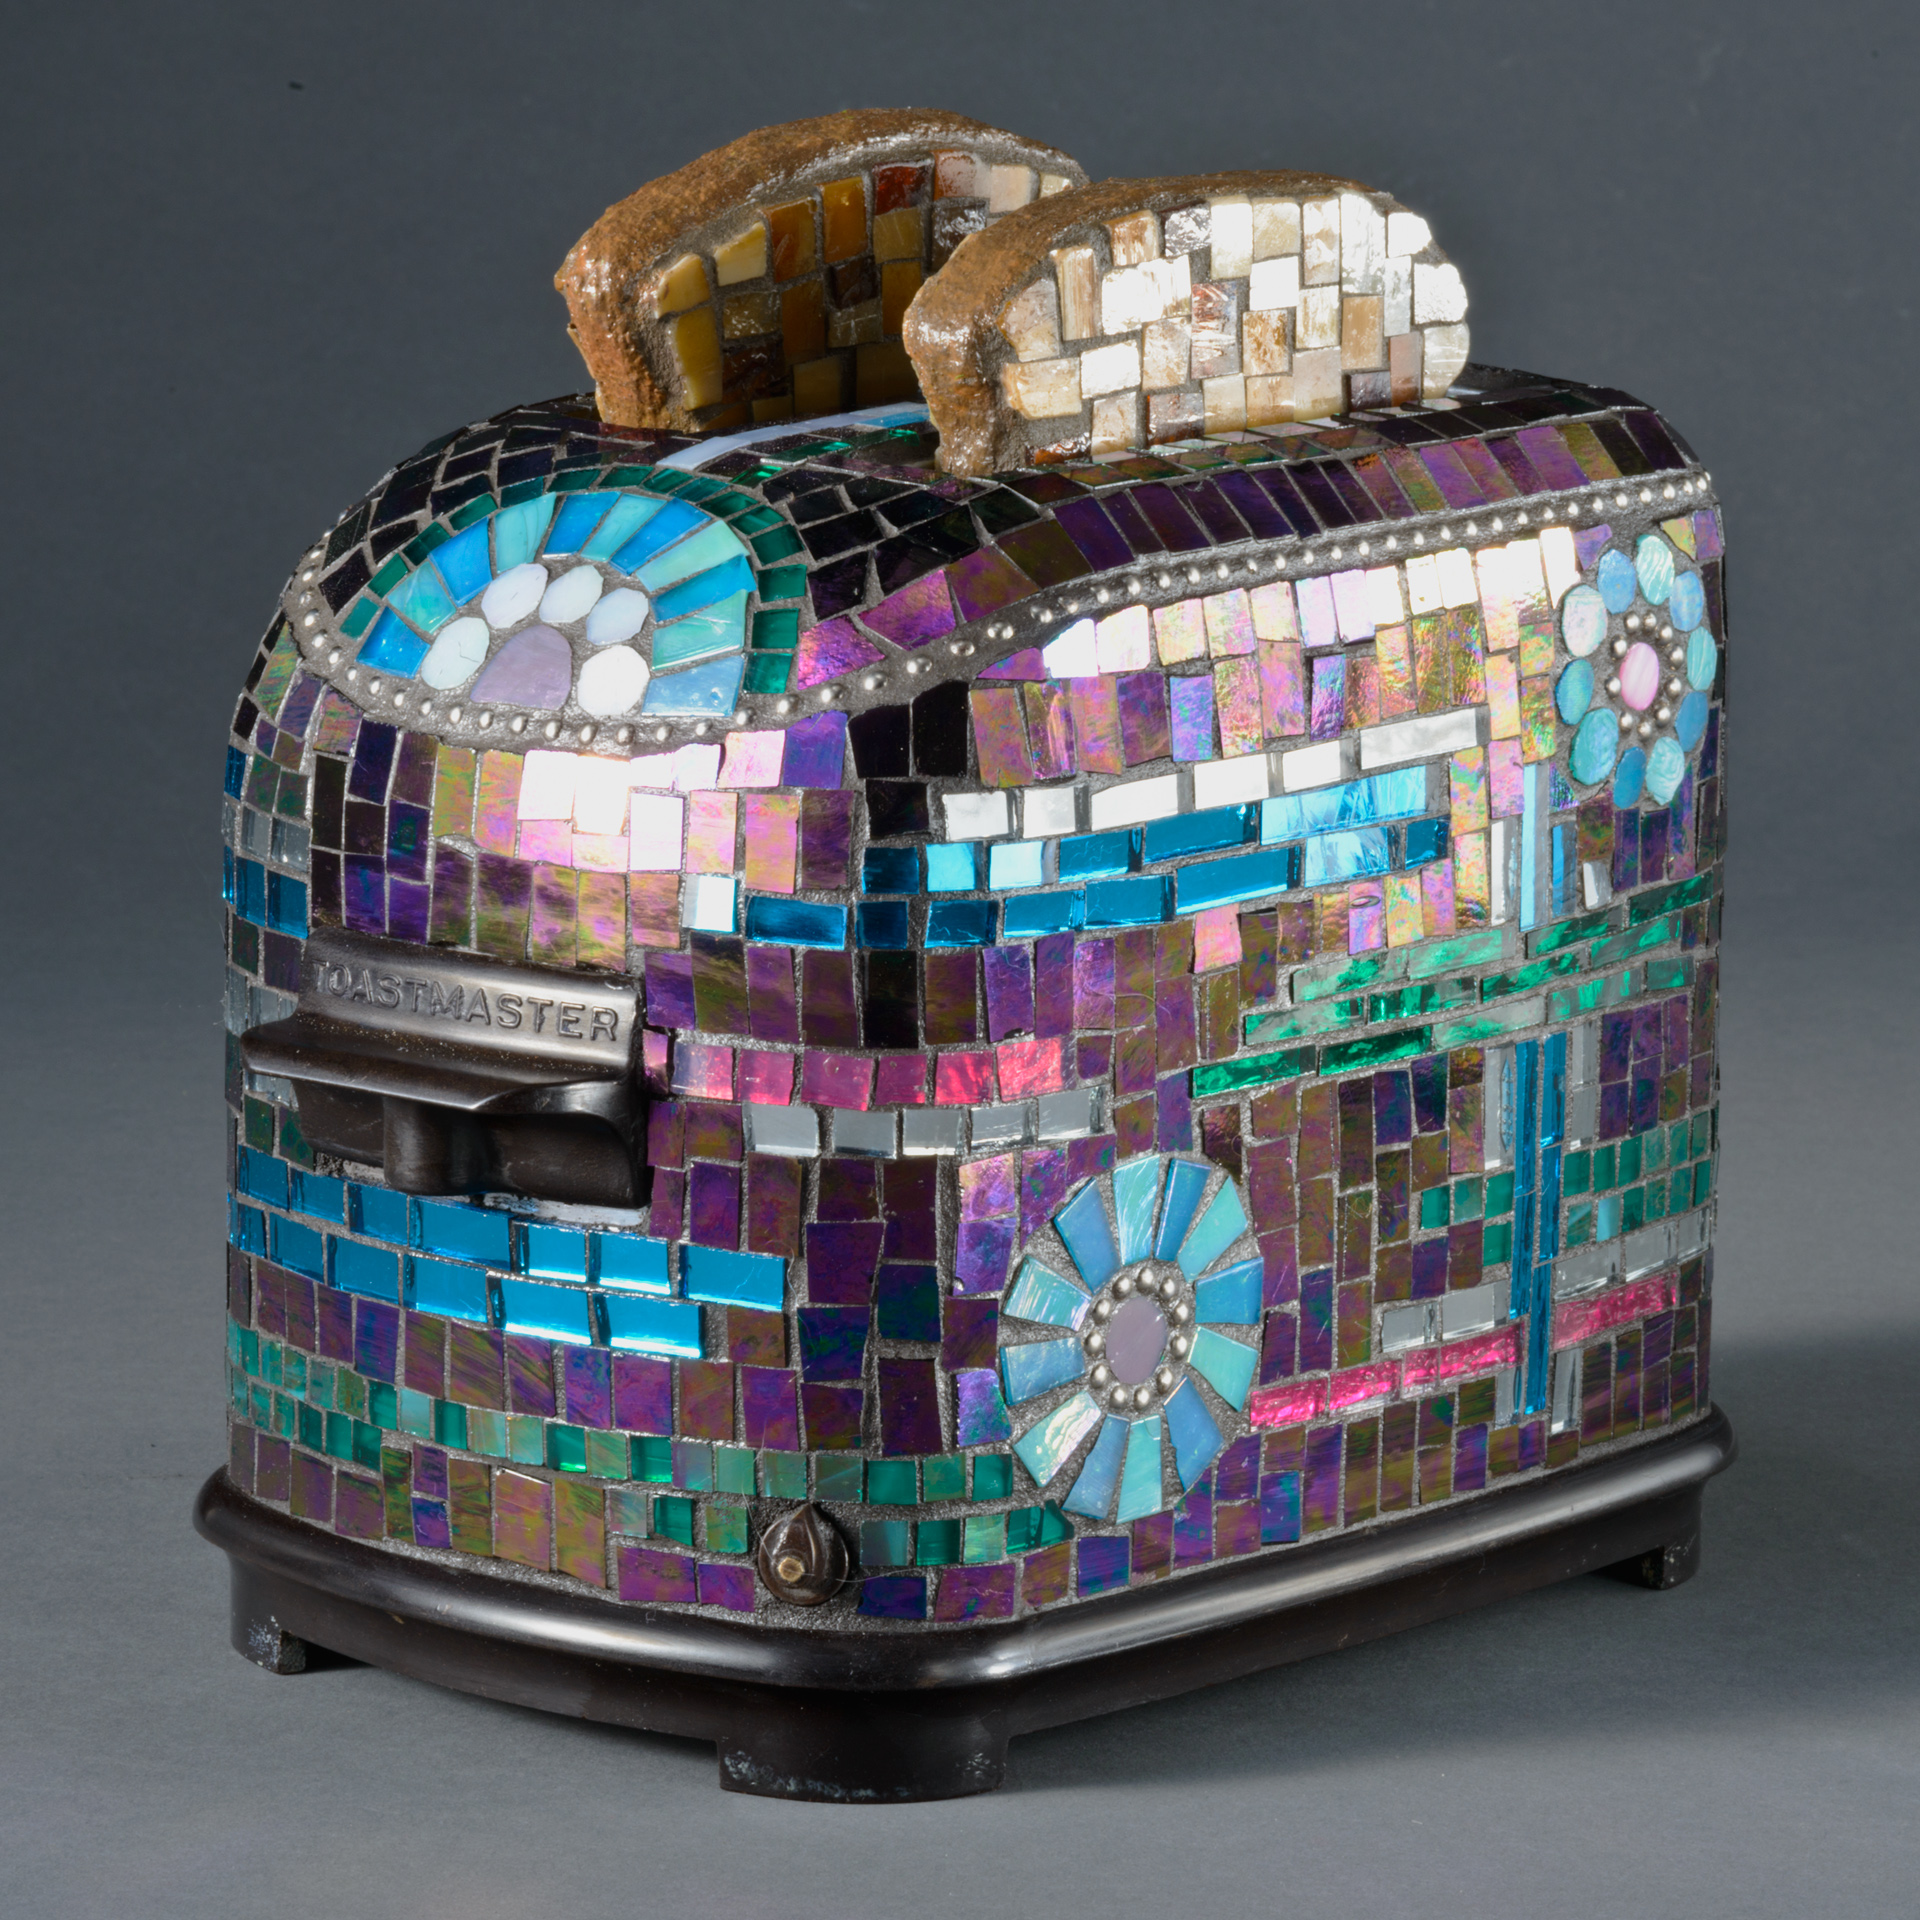 Toaster2_05z.jpg